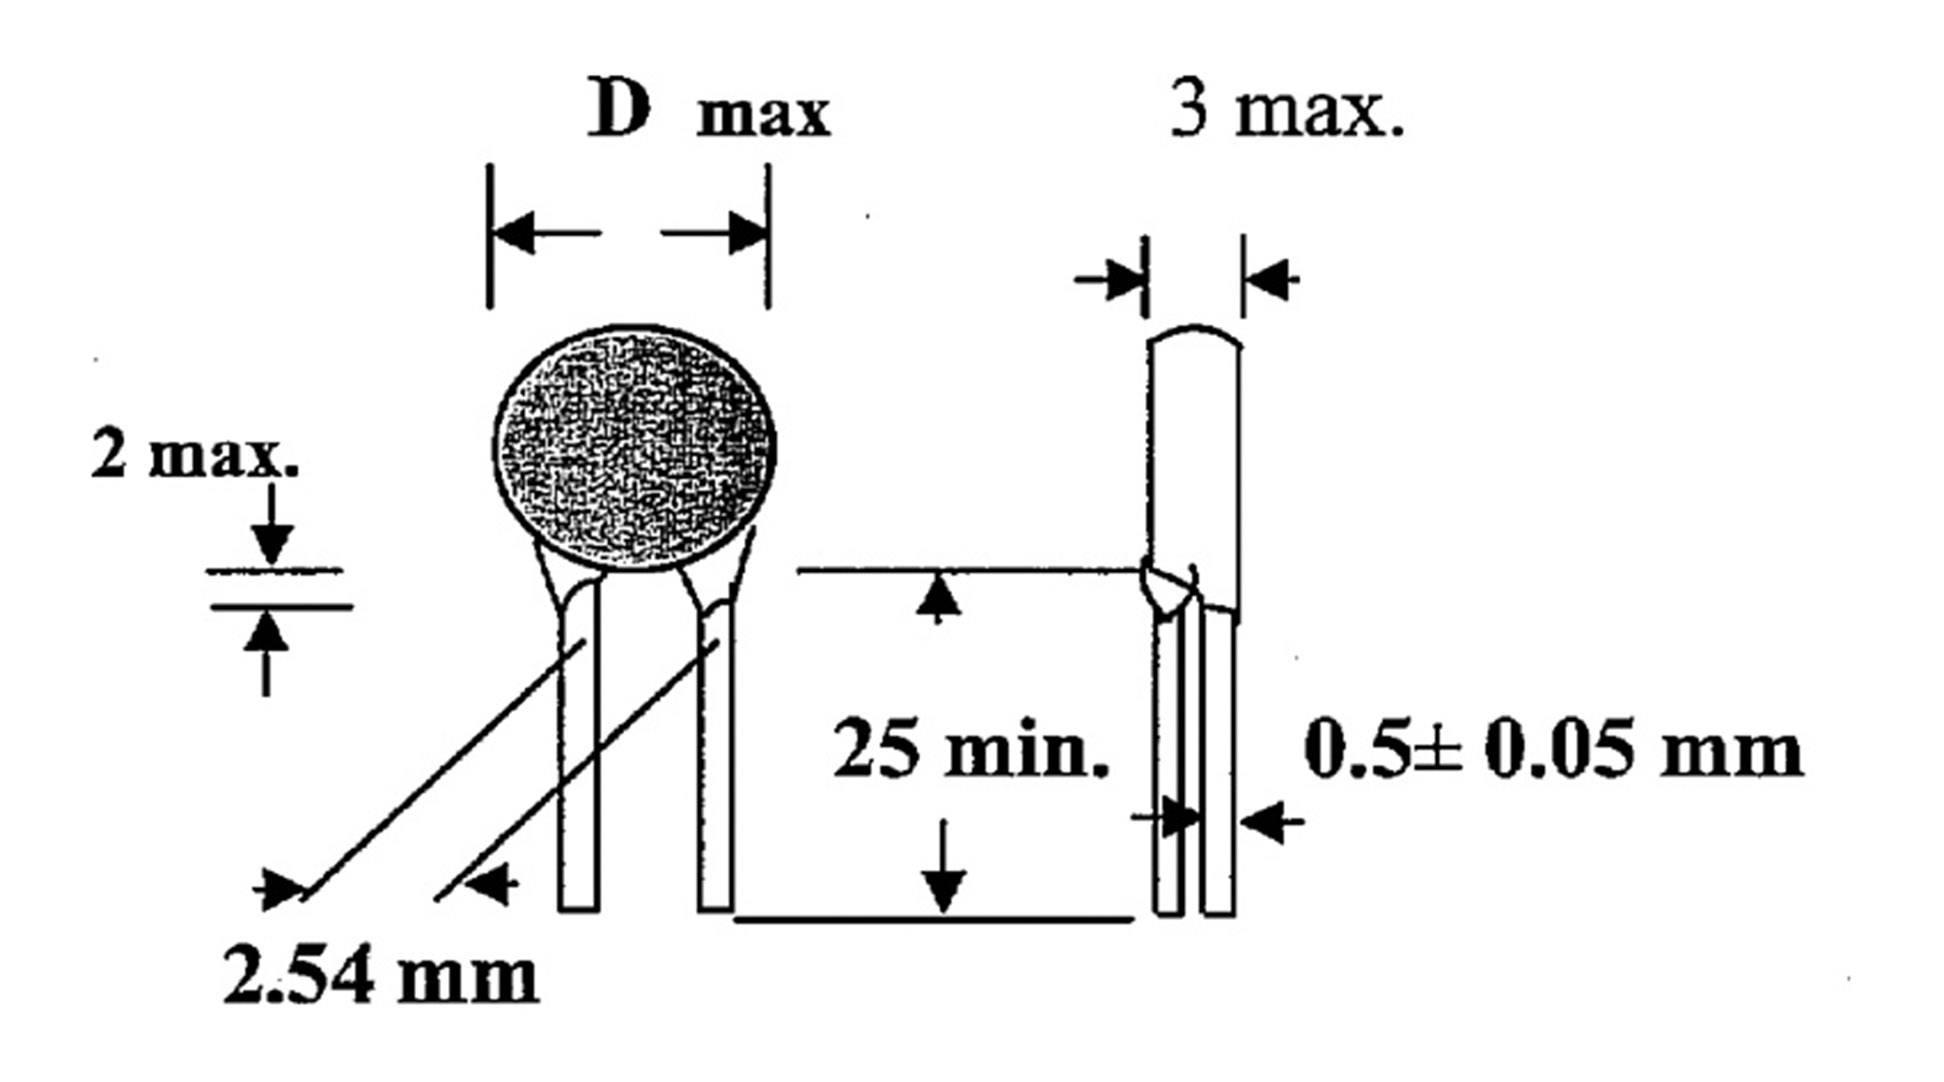 Keramický kondenzátor THT TRU COMPONENTS TC-K47PF2, 47 pF, 100 V, 5 %, 1 ks